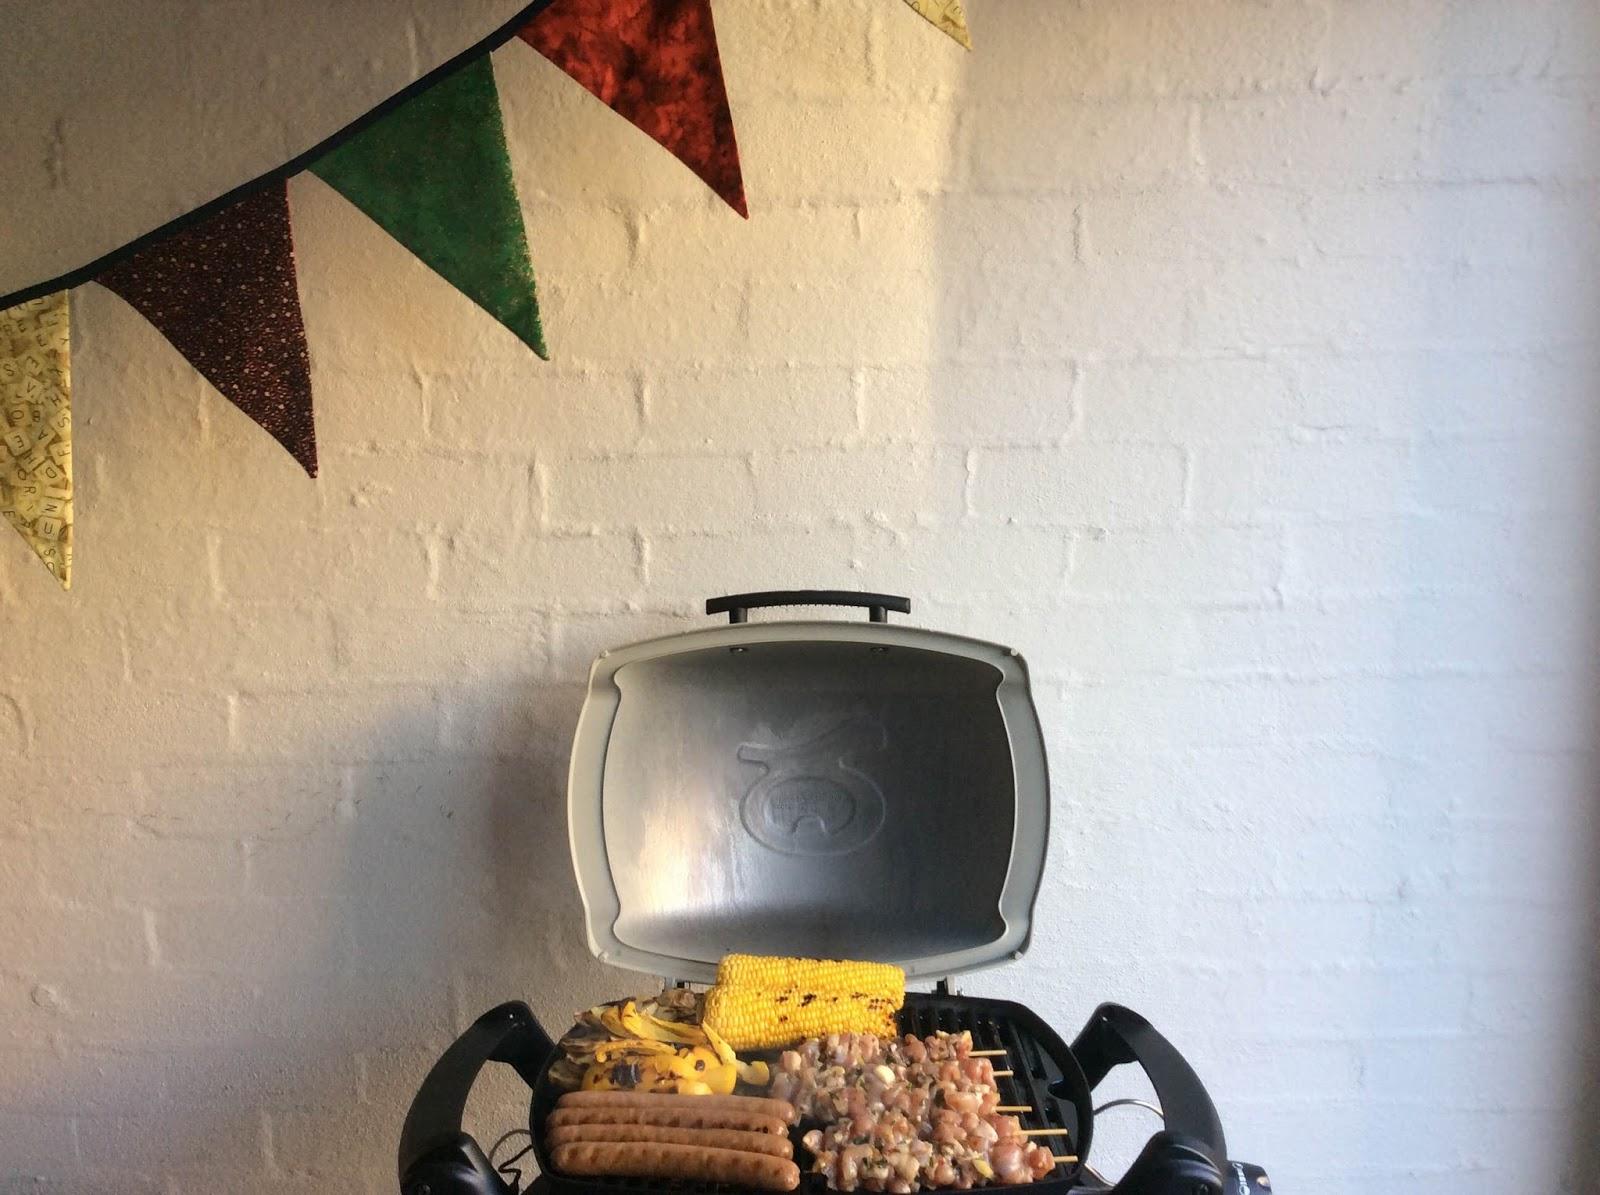 David Jones Kitchen Appliances Adventures In Tv Land February 2016